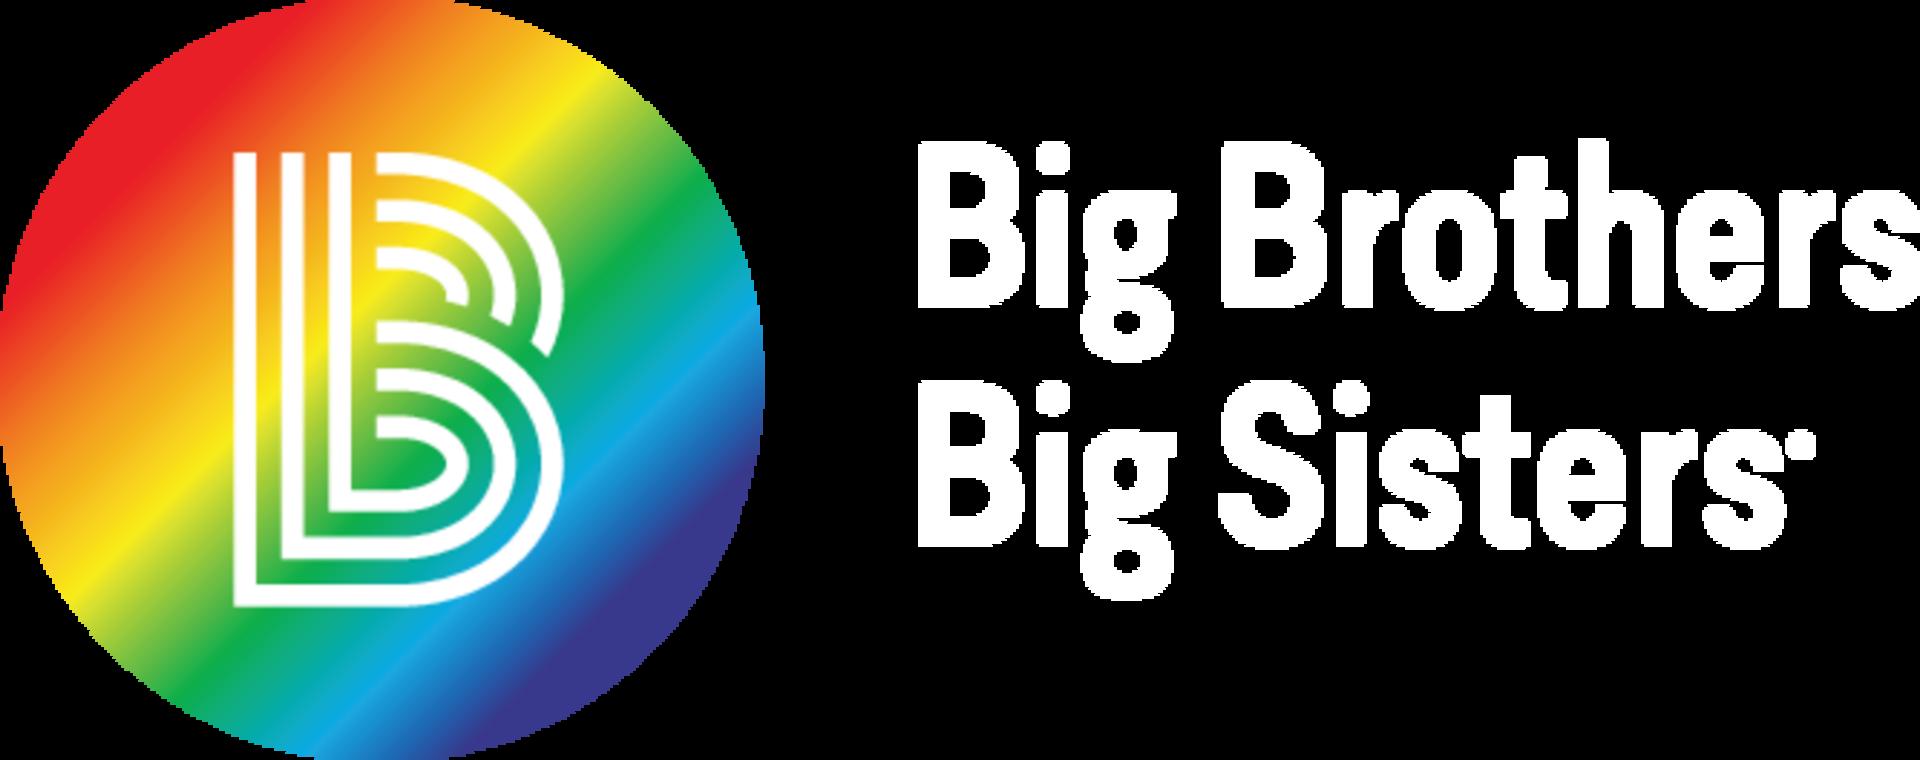 BBBS_LGBTQI_Logo_White_RGB-8000x3172-4b737db